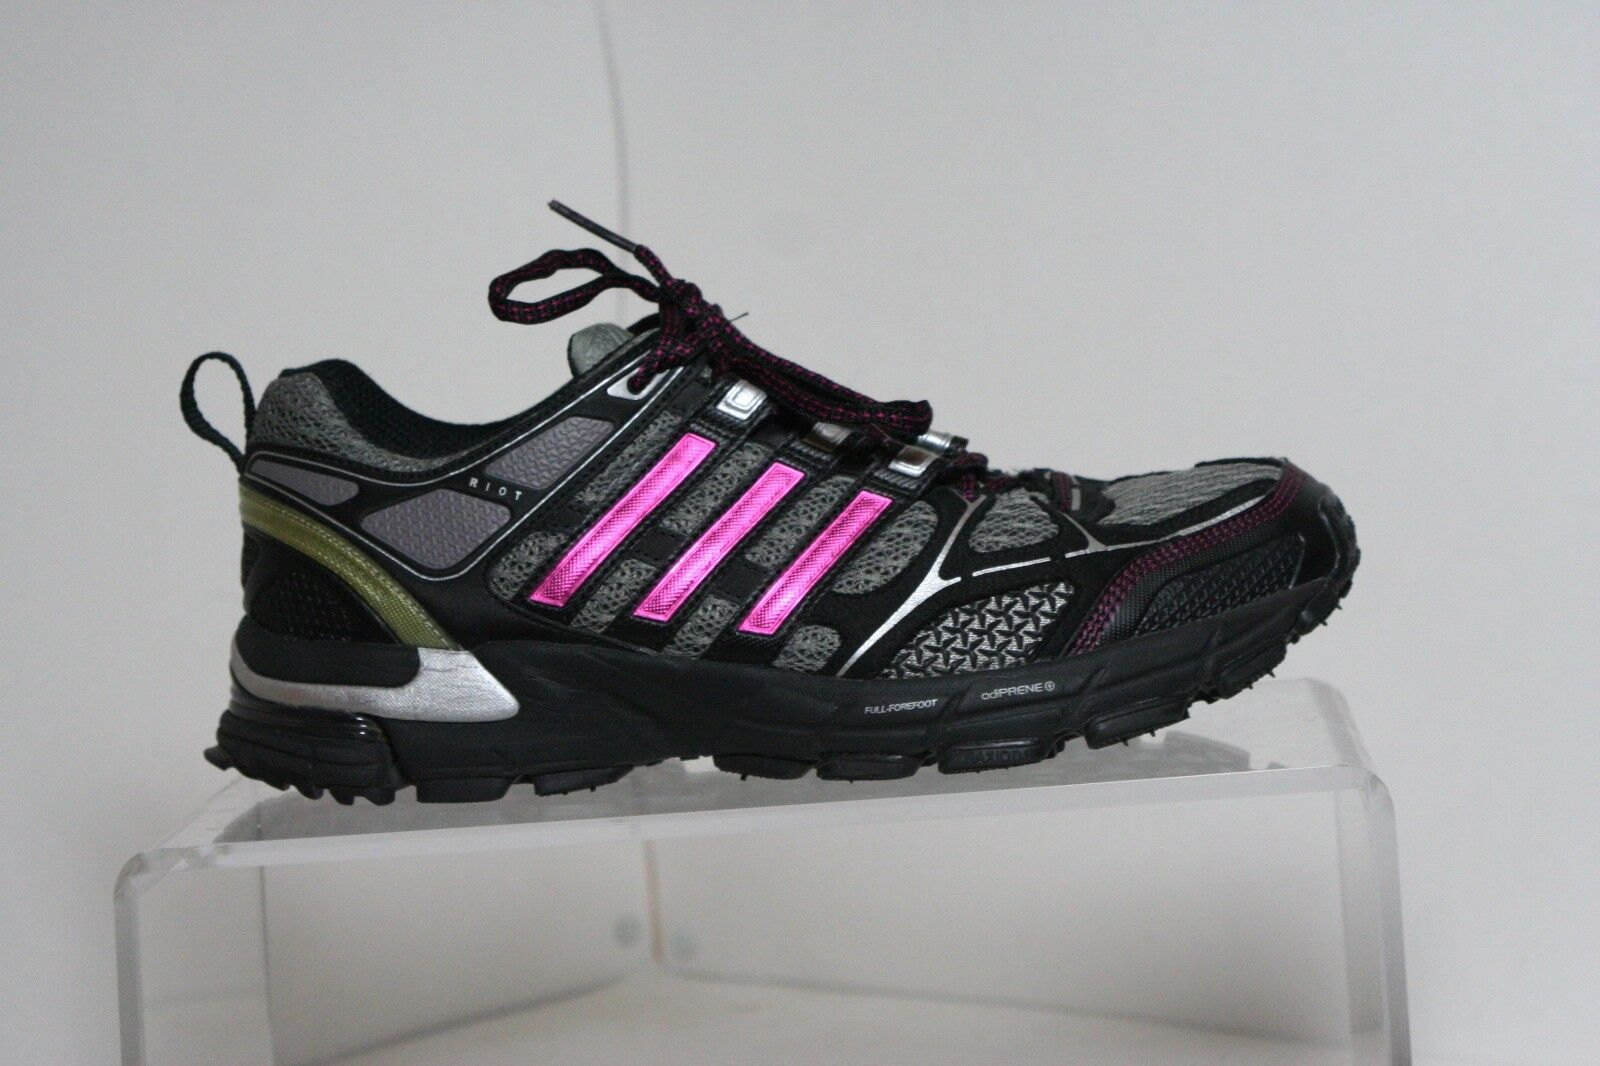 Adidas Supernova Riot 3 Running Trail Sneaker '10 Multi Black Pink Women 10 Hip